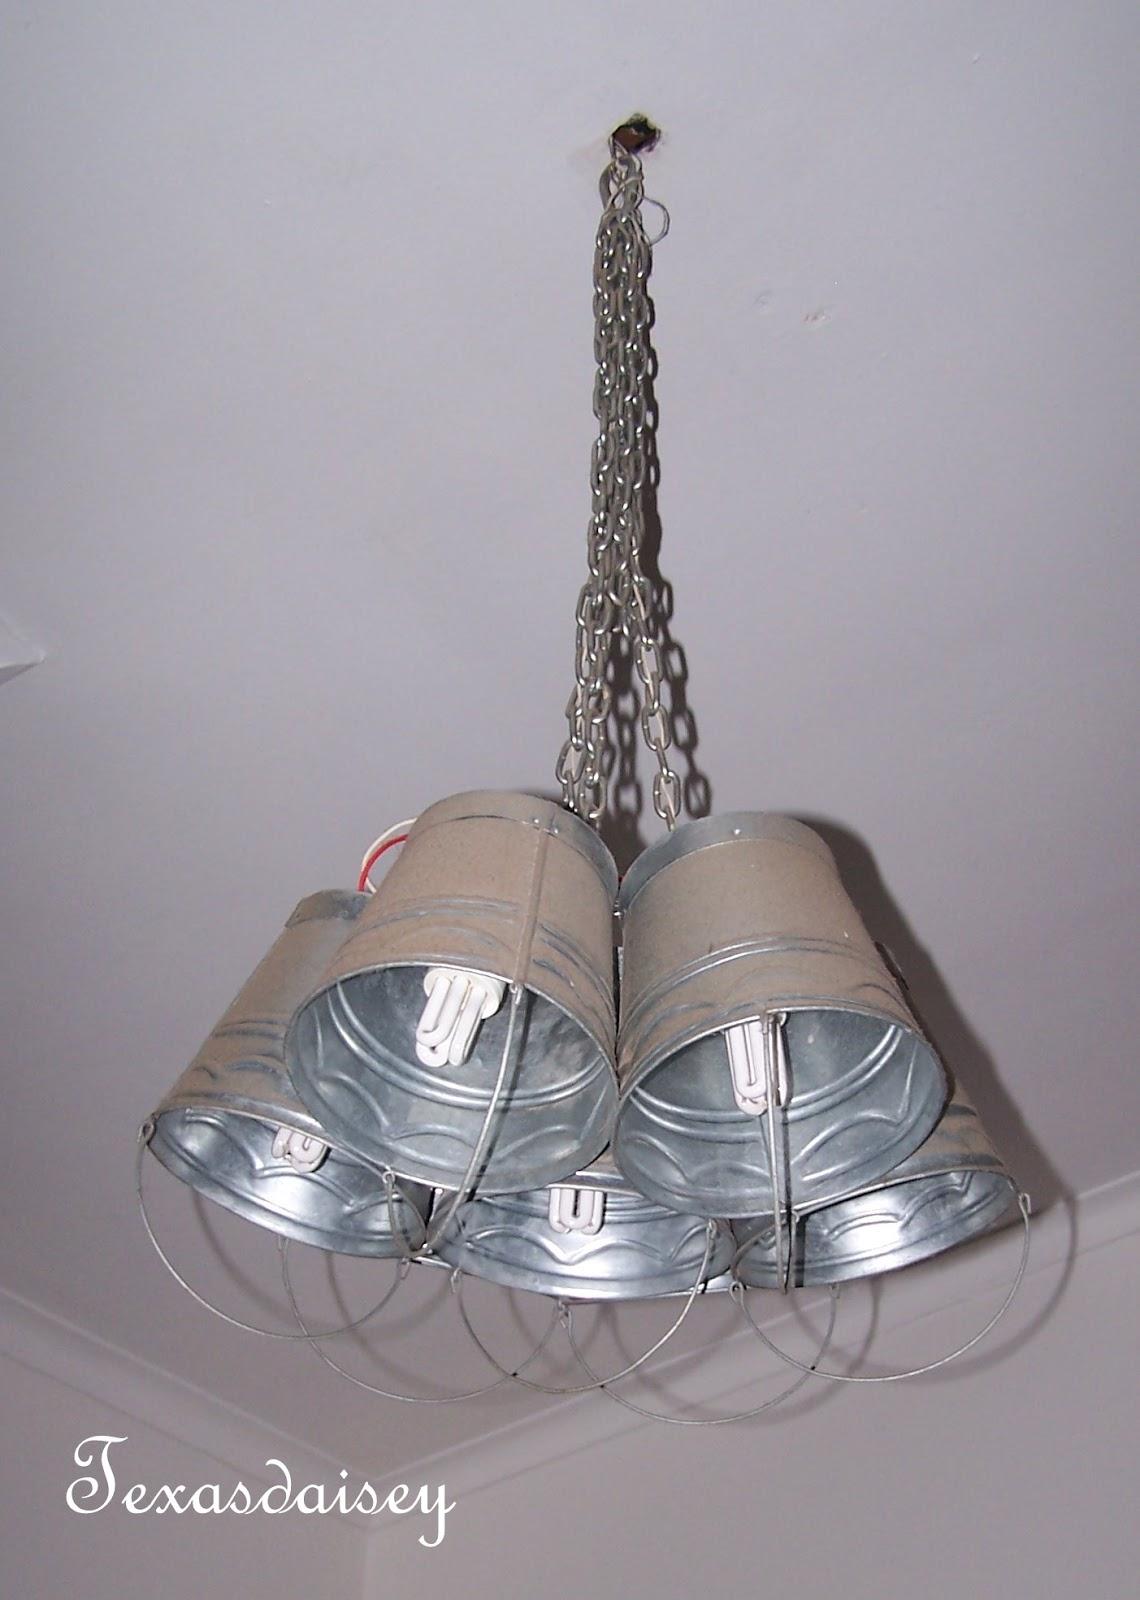 Texasdaisey Creations: Galvanized Light Fixture